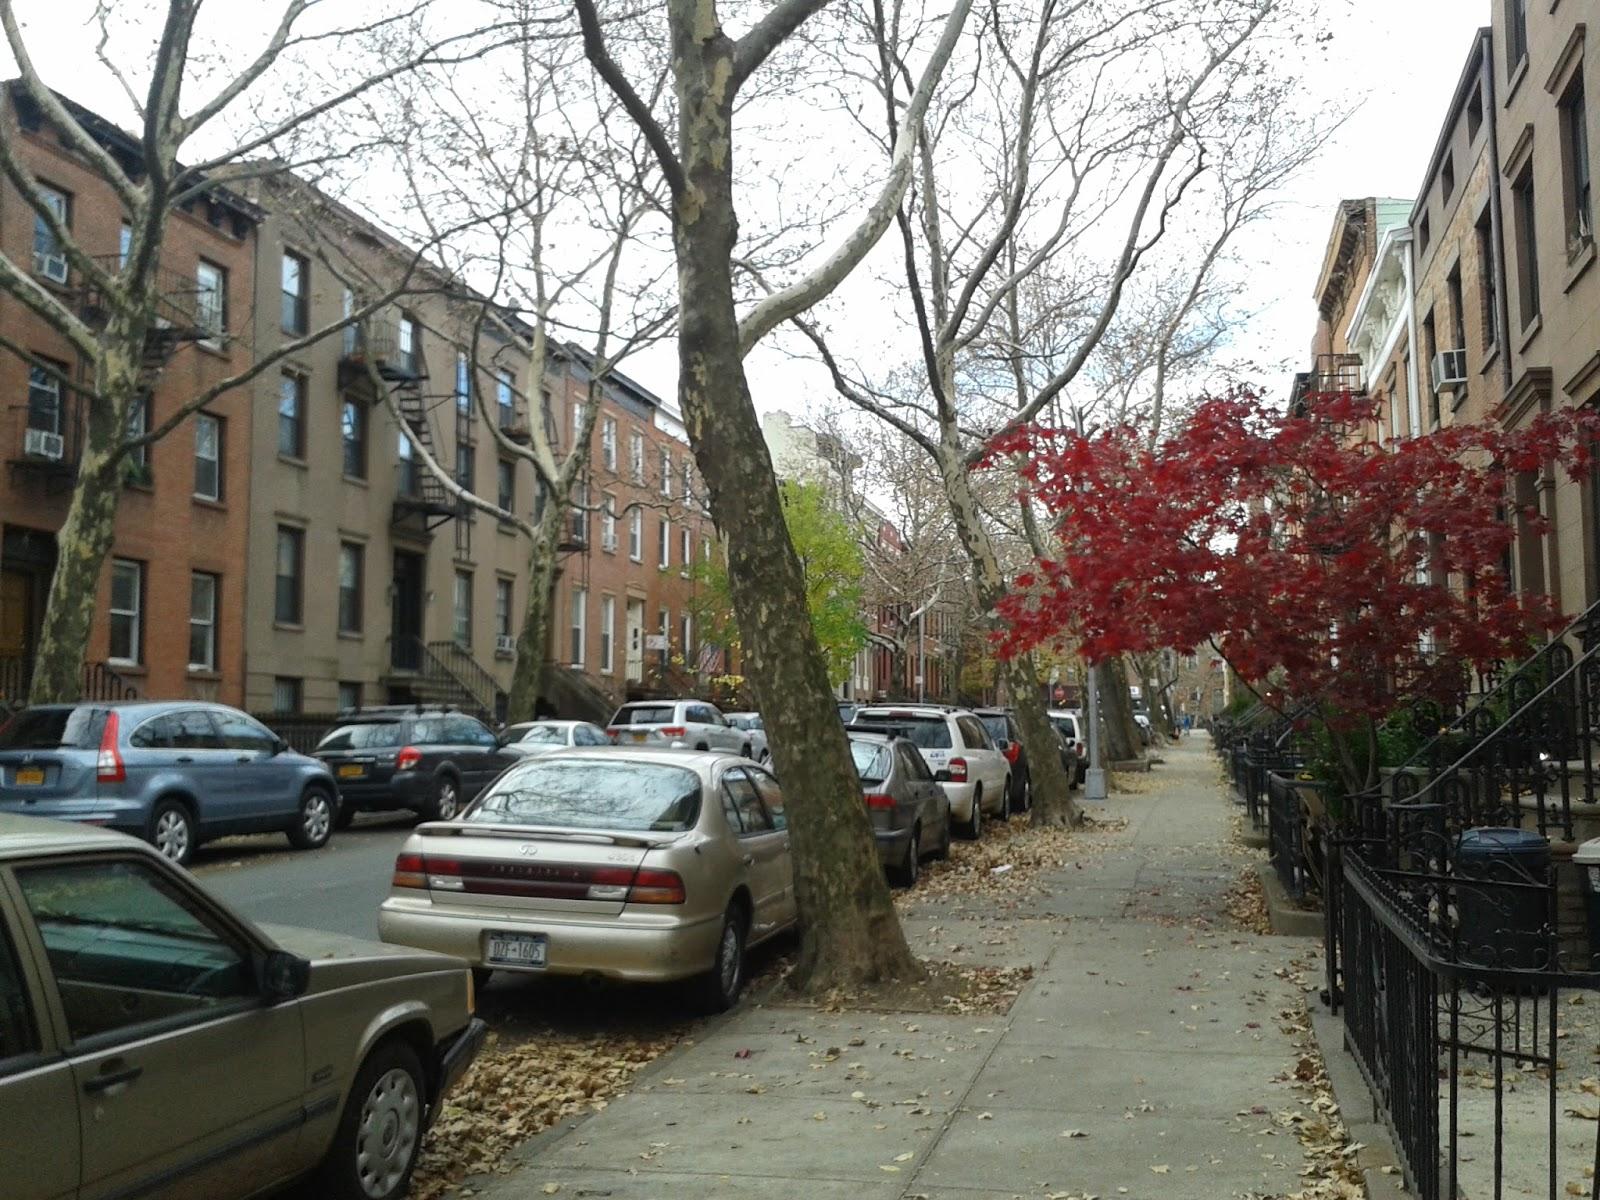 Provence en boite,un petit coin de Provence…à Brooklyn